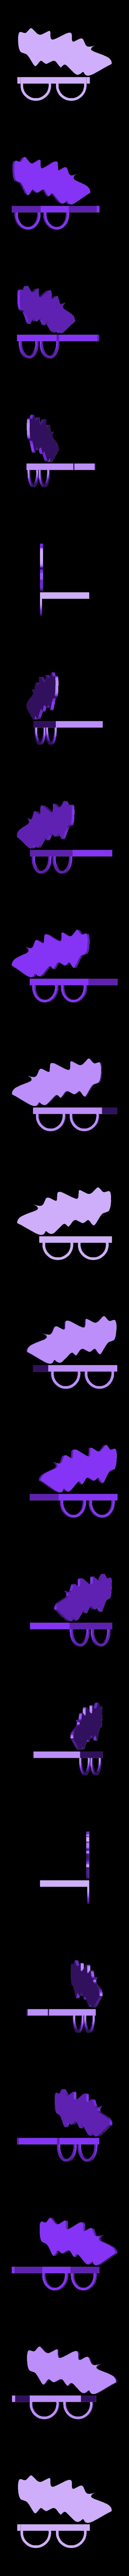 geekycarots2.stl Télécharger fichier STL gratuit Geek Carotte • Objet imprimable en 3D, Not3dred